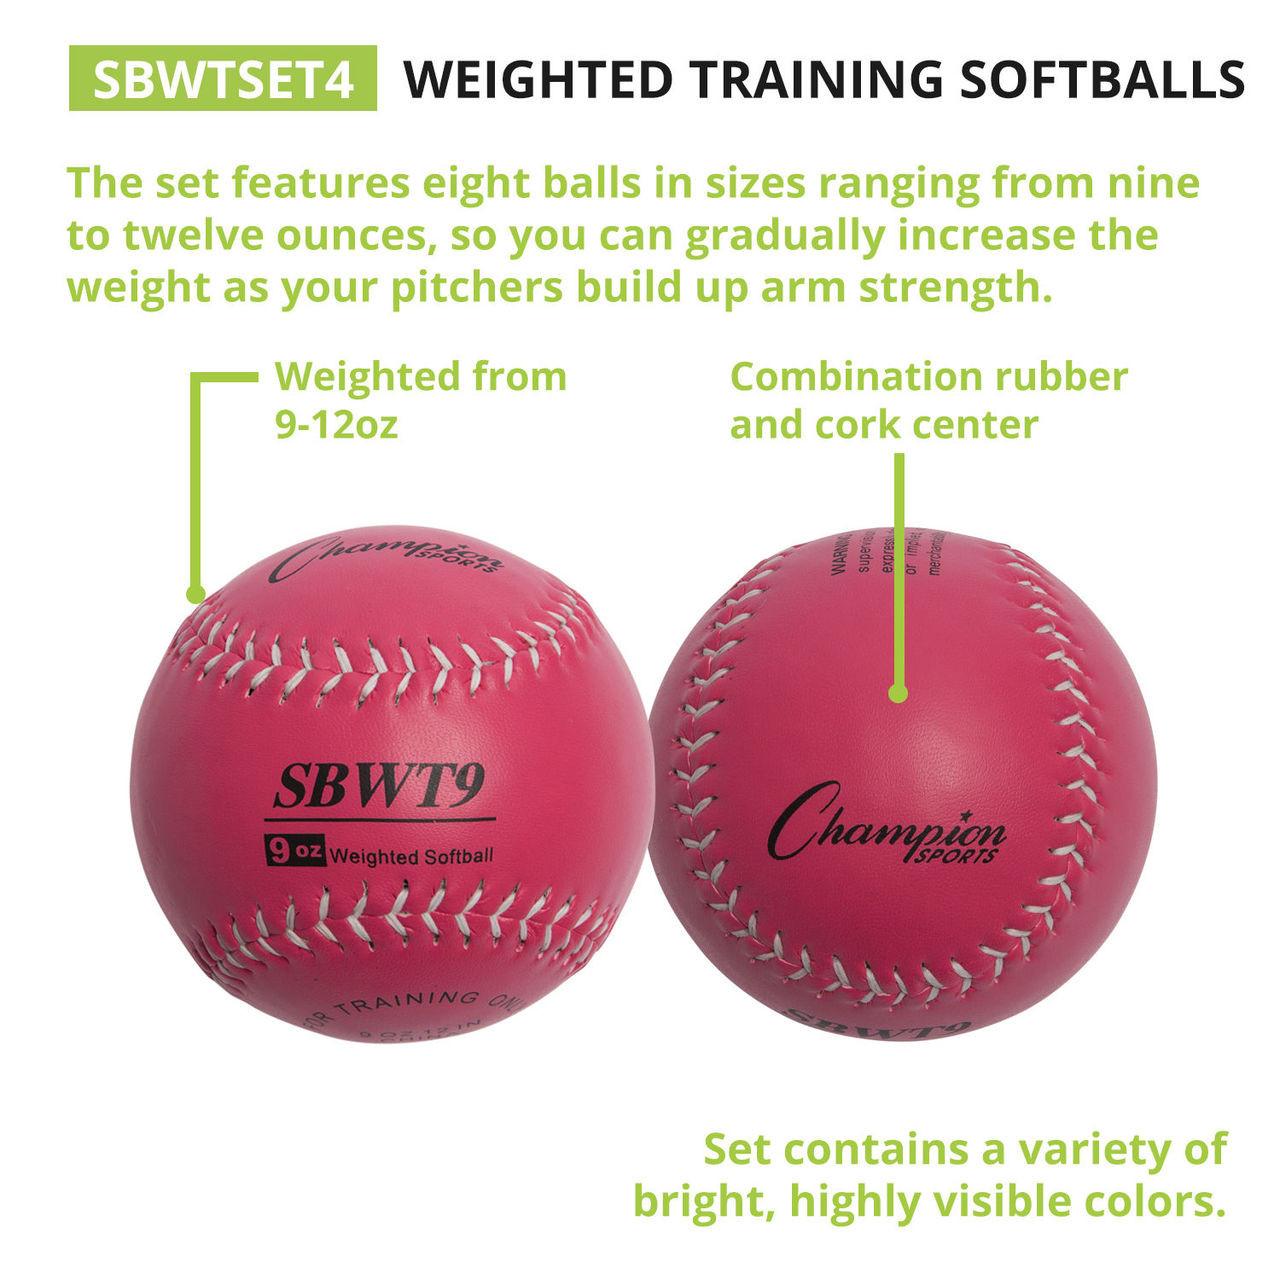 Champion Sports Weighted Training Softball Set of 4 (SBWTSET4)